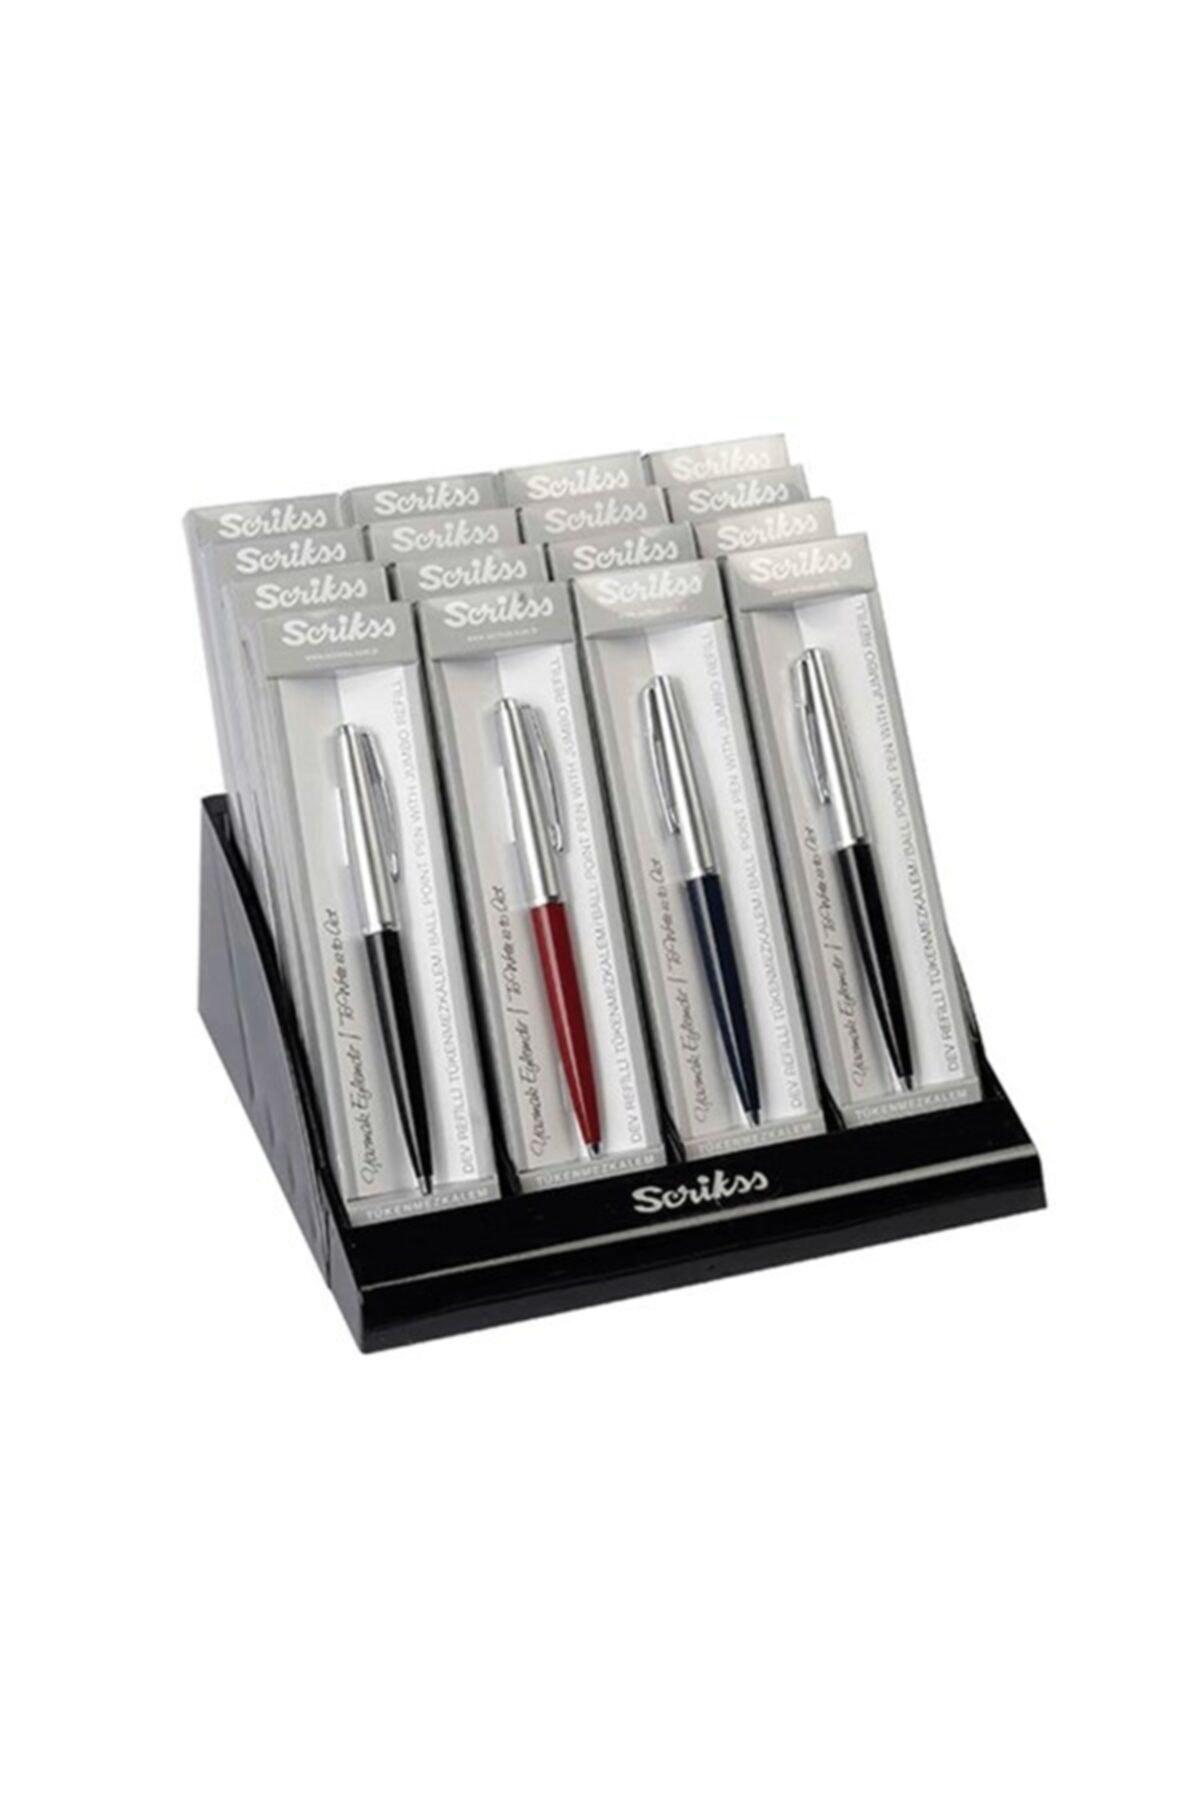 Scrikss 78 Tükenmez Kalem ( 16 Lı Stand ) 1